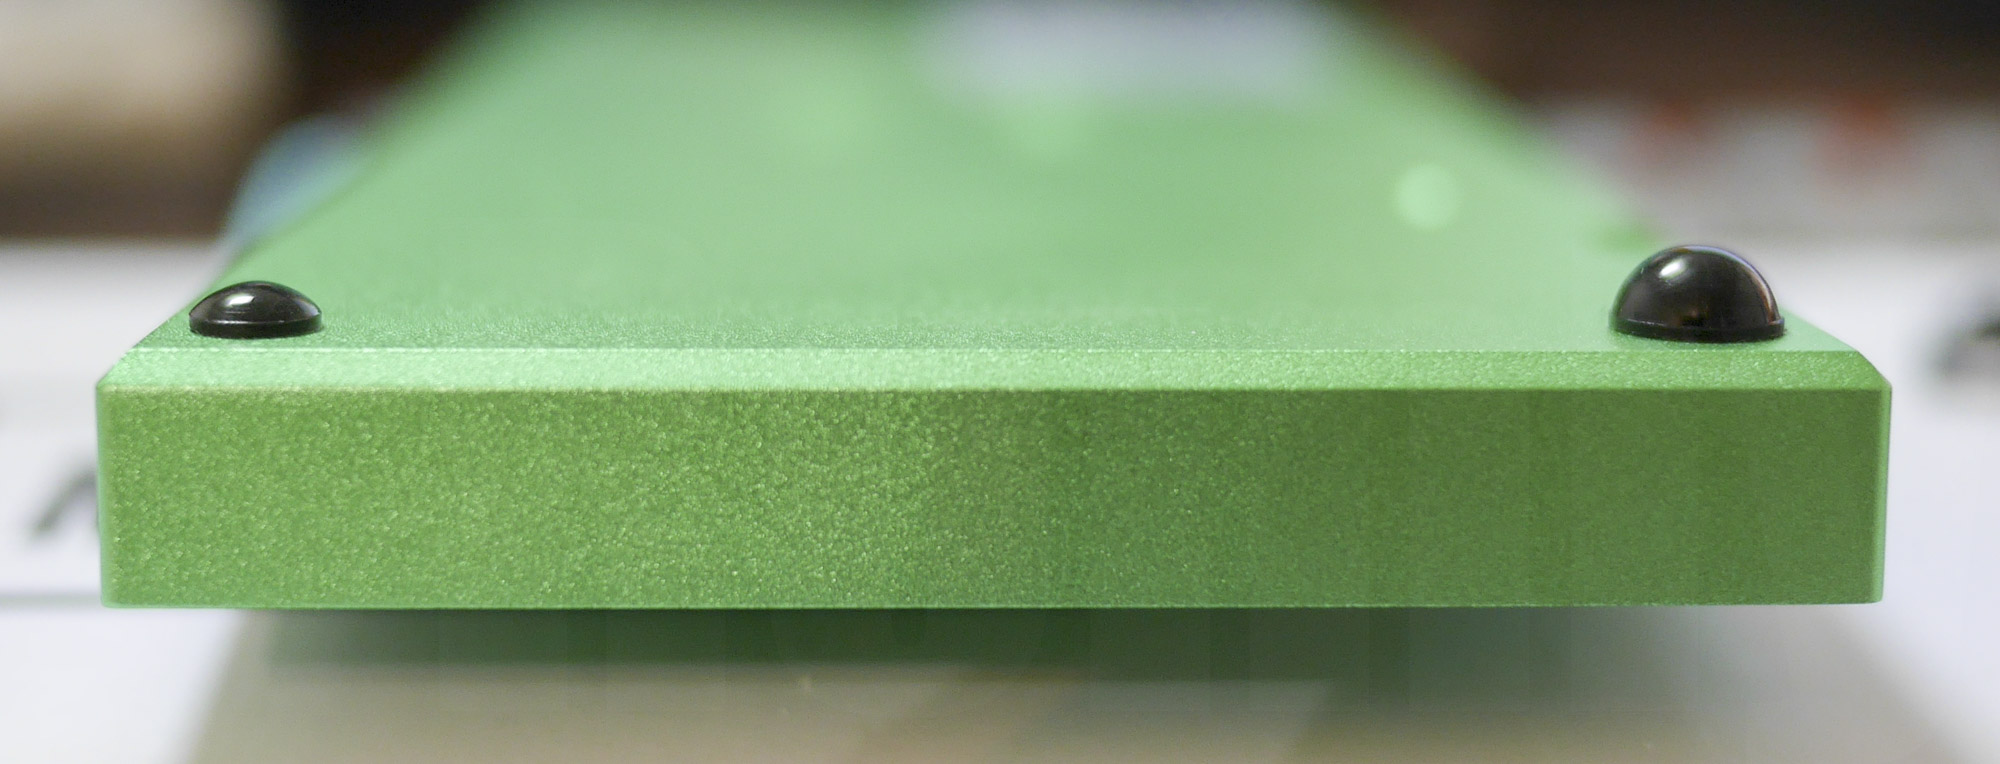 Planck Keyboard: ゴム足による傾斜作成1